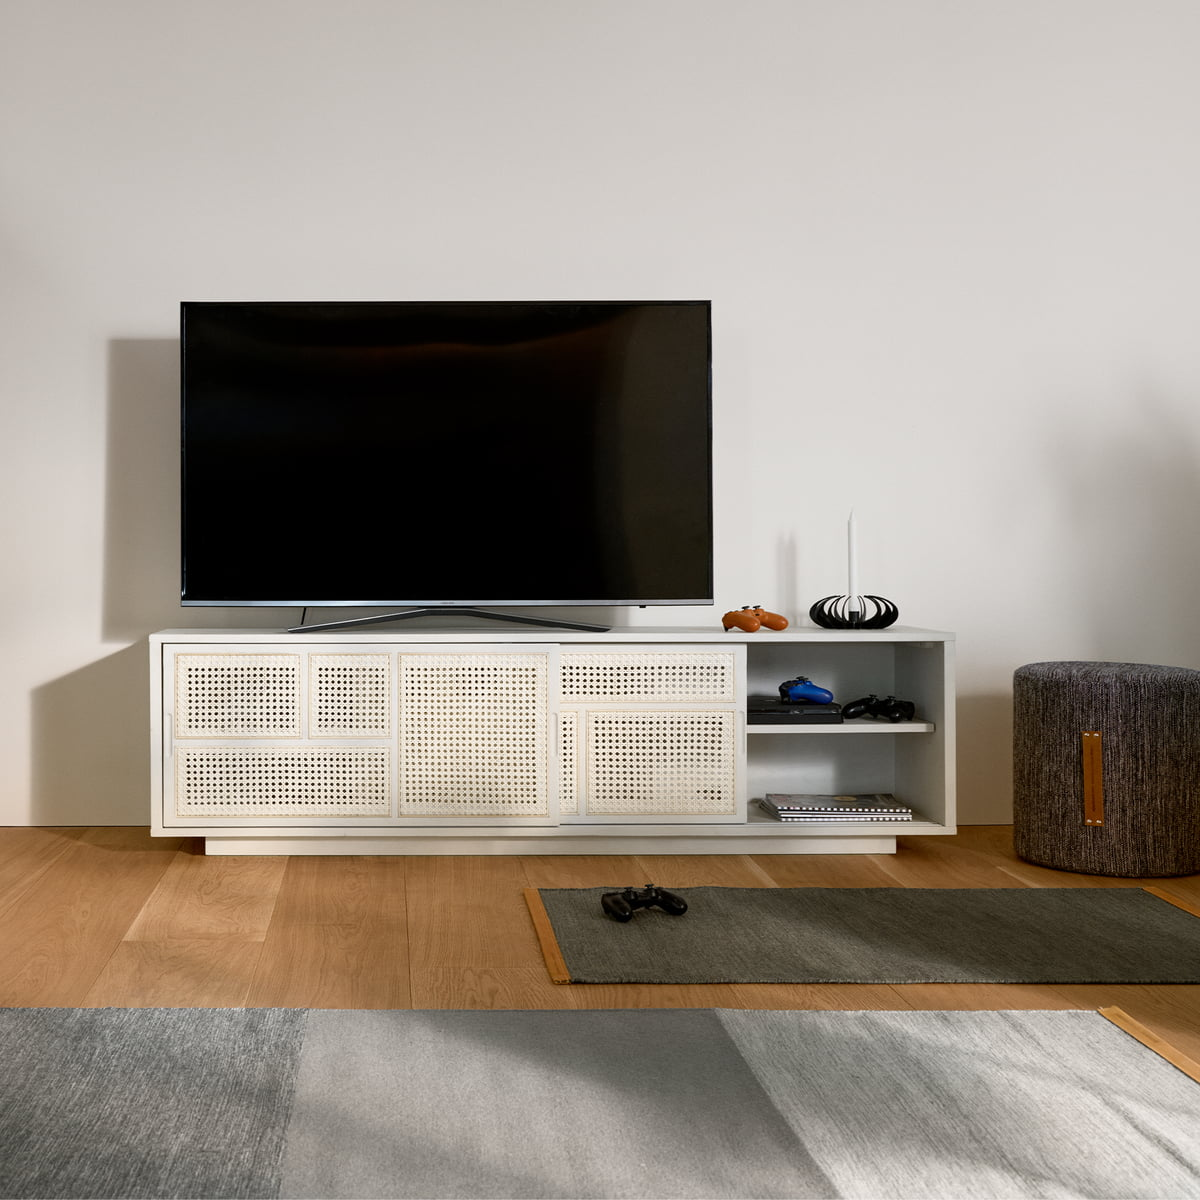 Design house stockholm   Air sideboard / tv console, black